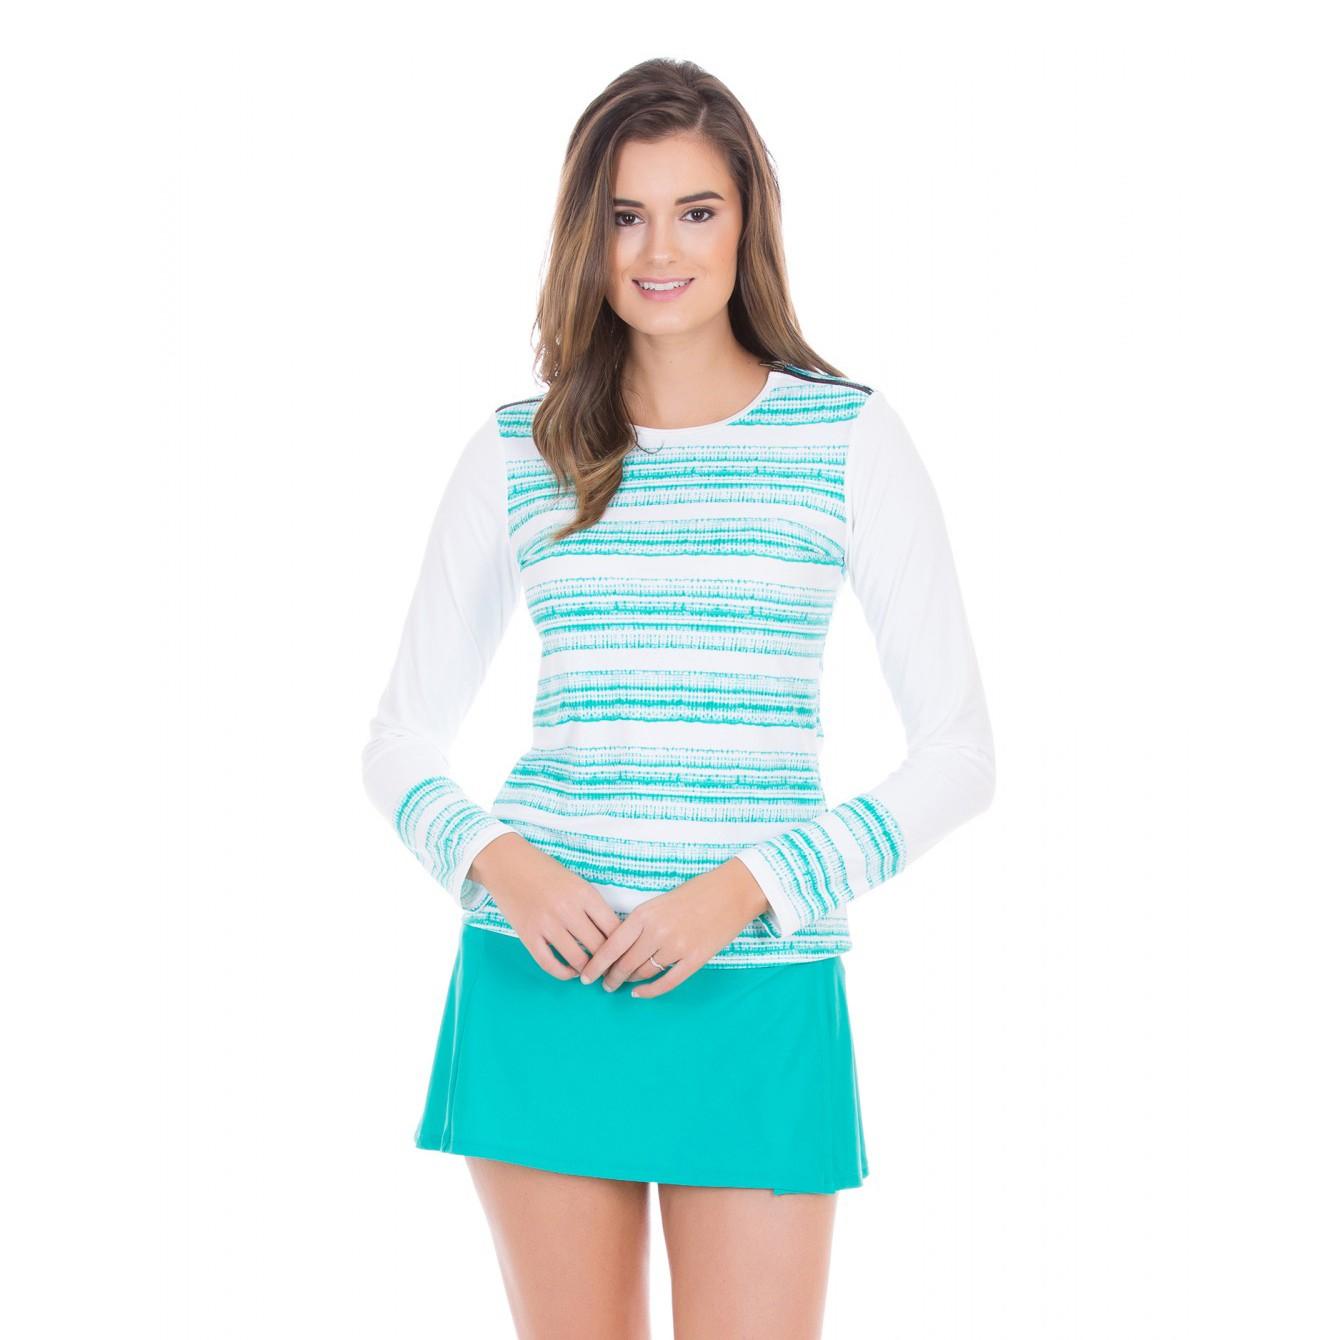 Cabana Life Basics Shoulder Zipper +50 UV Rashguard (Womens)